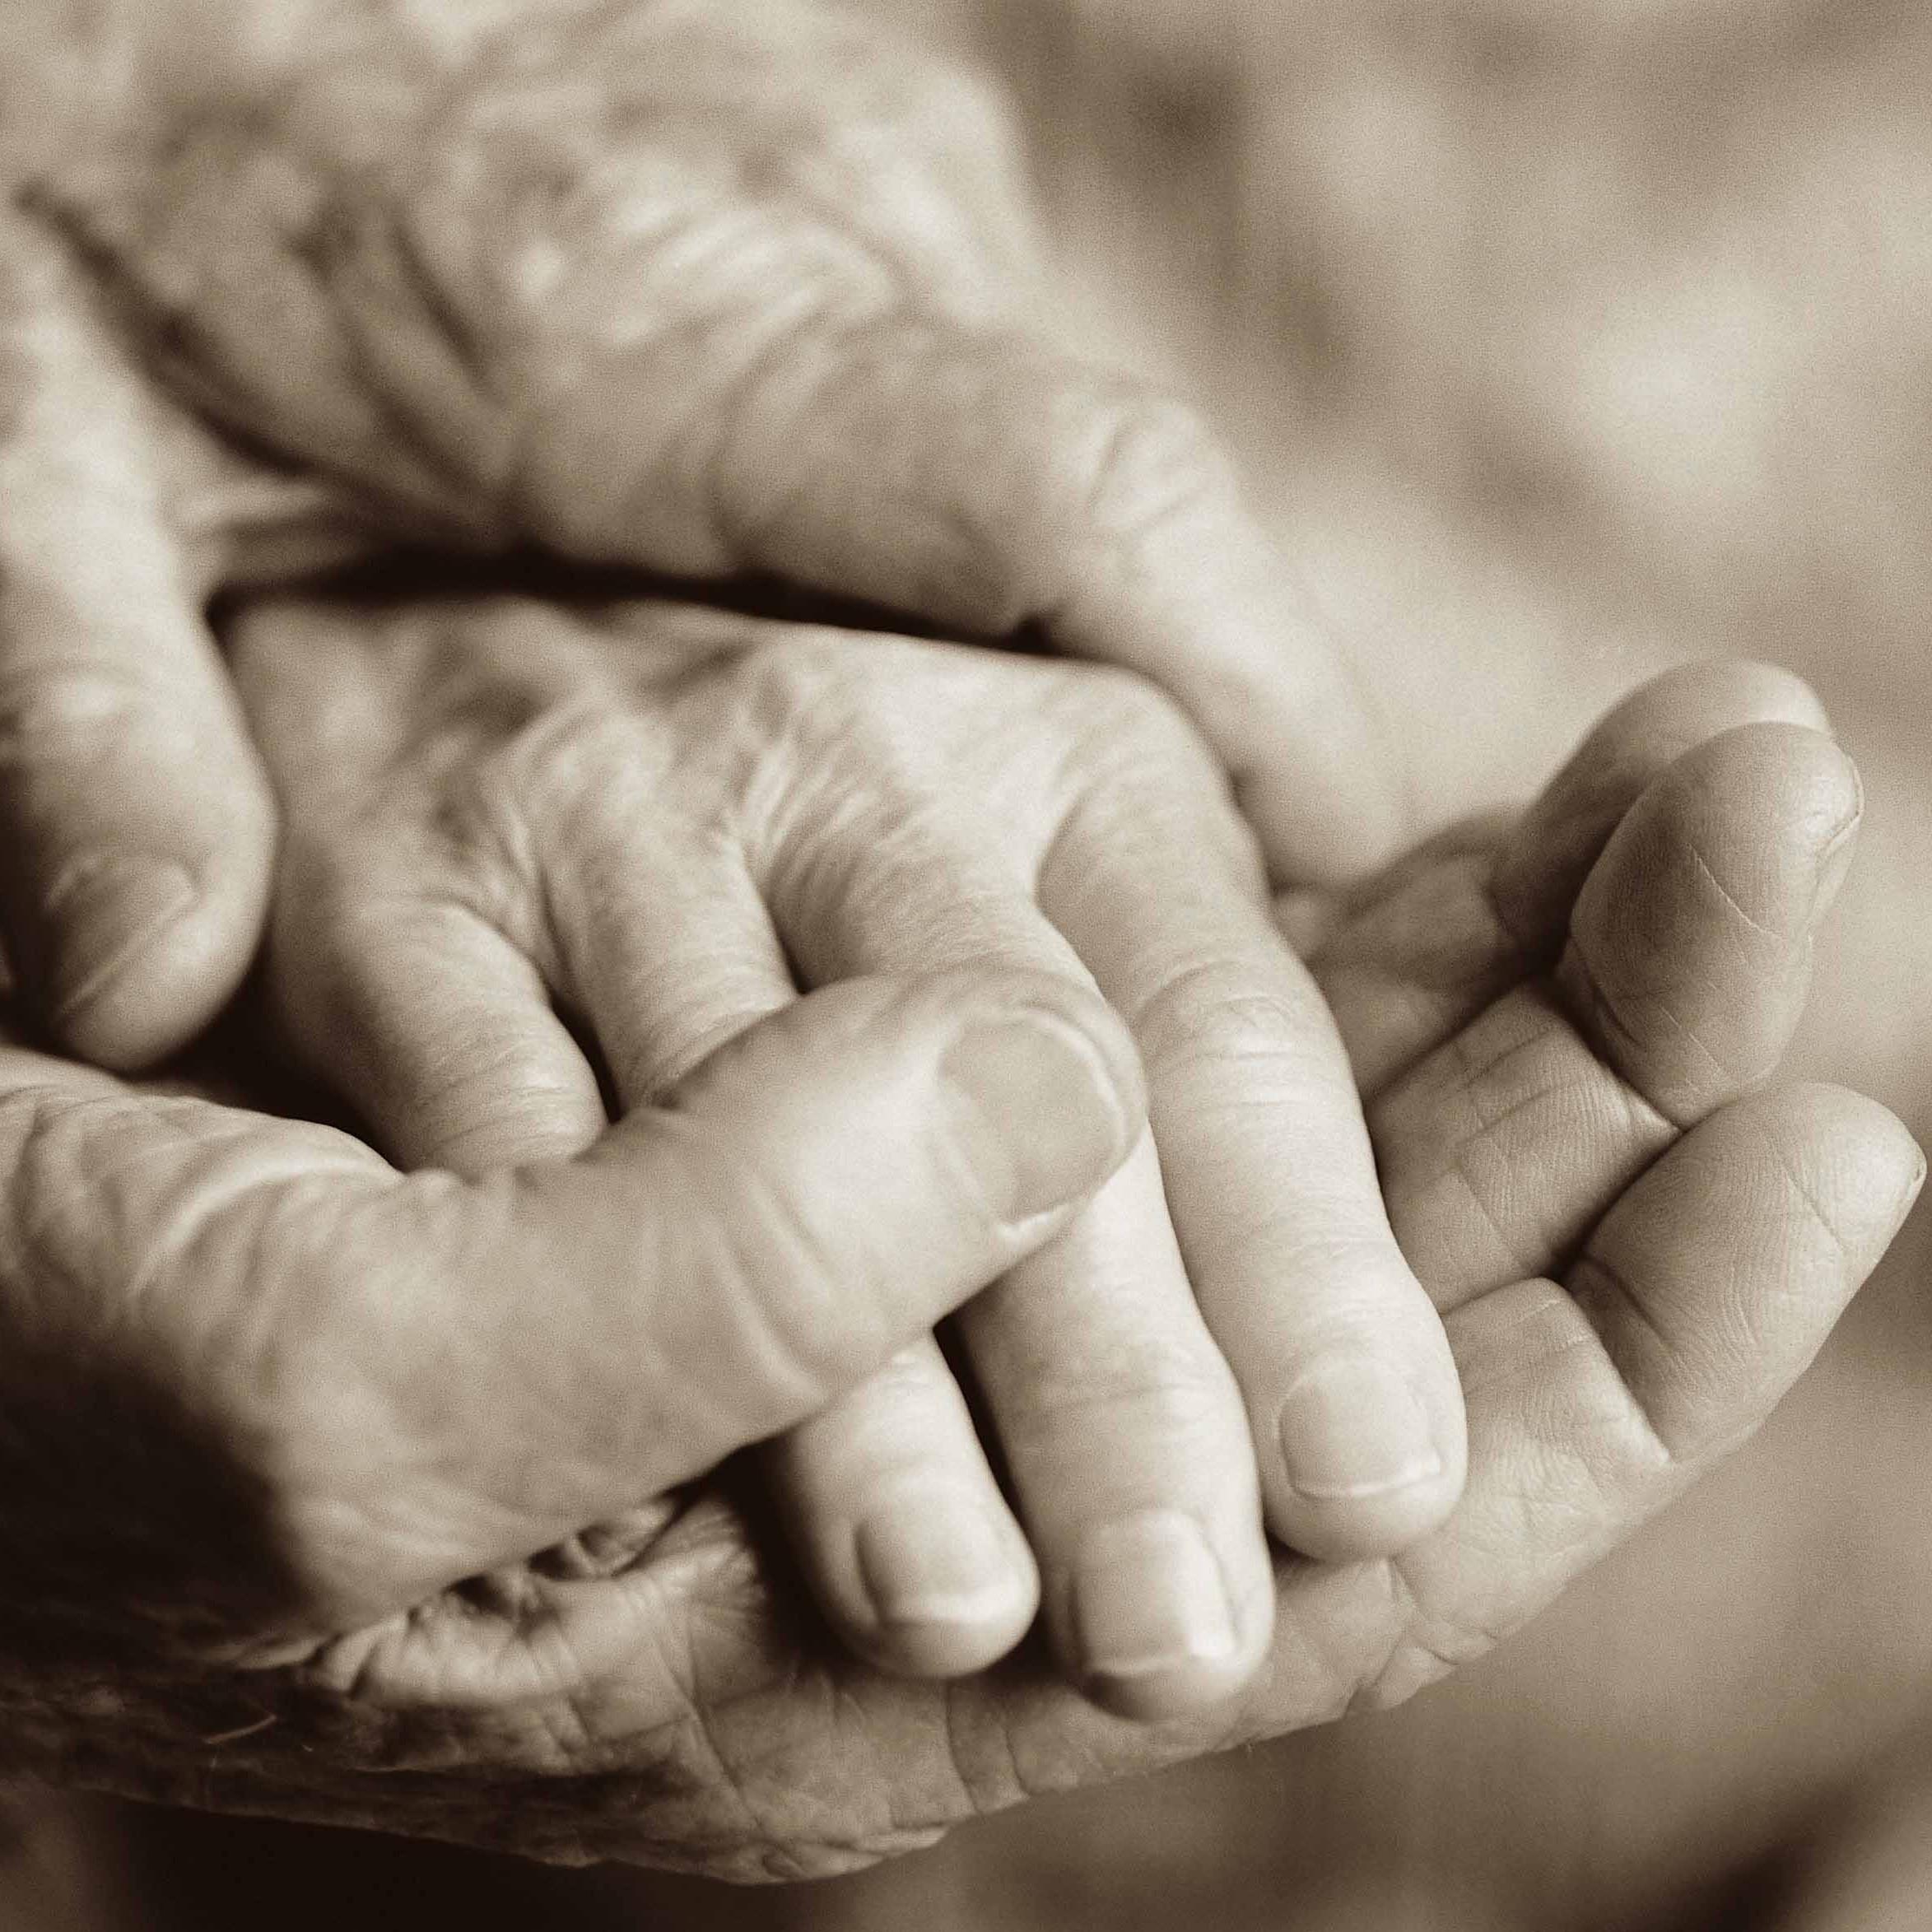 euthanasia pros and cons essays studymode the pros yes and cons no of euthanasia debateorg